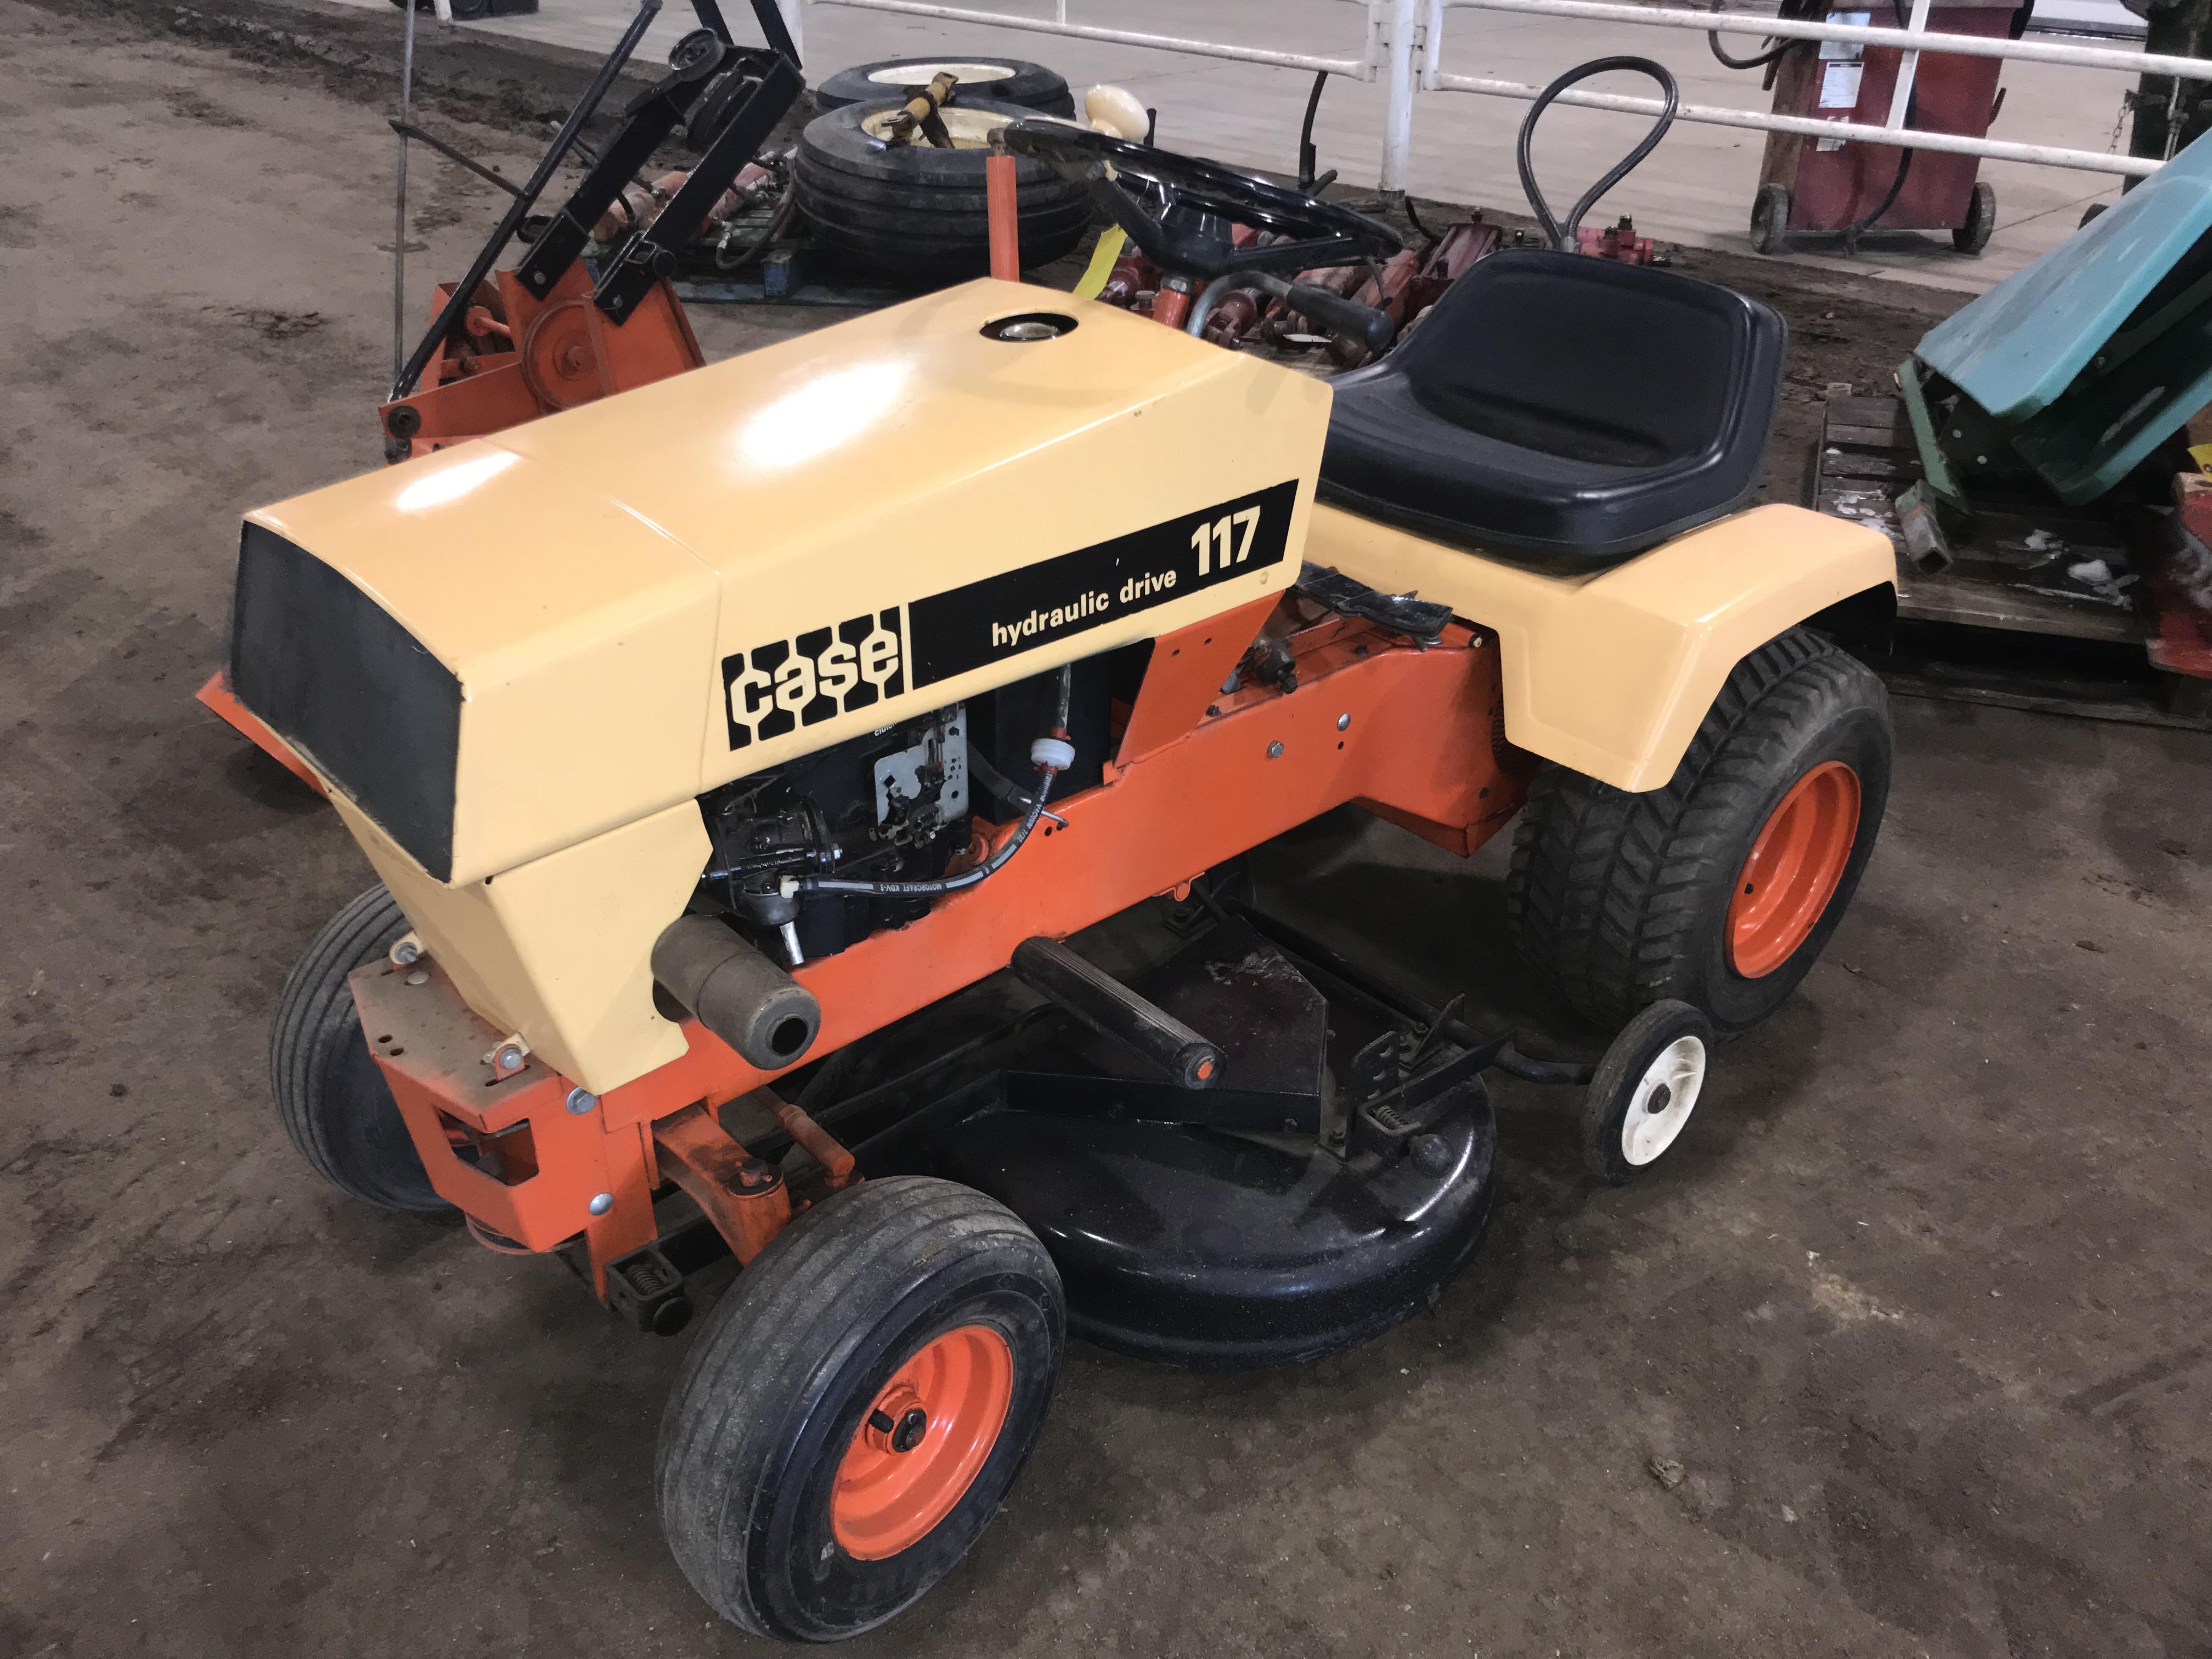 Lot 19 - Case #117 Hydro Mower w/Front Mount Snow Blower